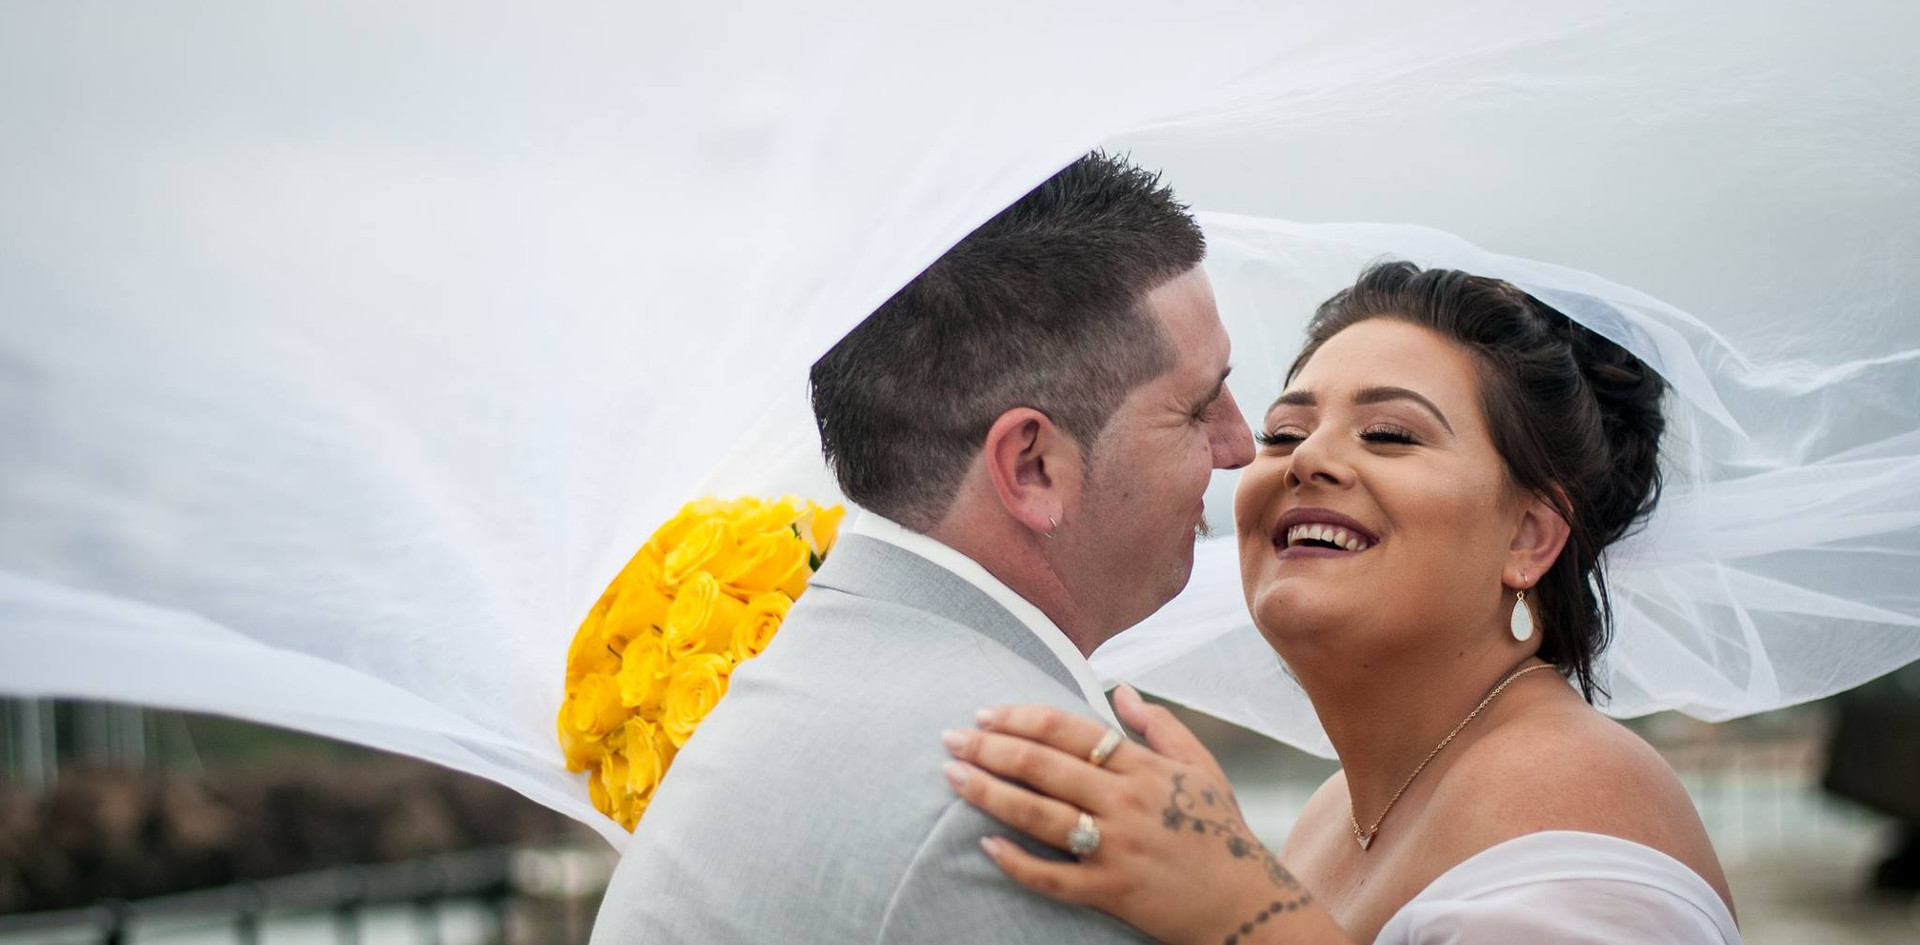 Domanie & Adam | WEDDING FILM